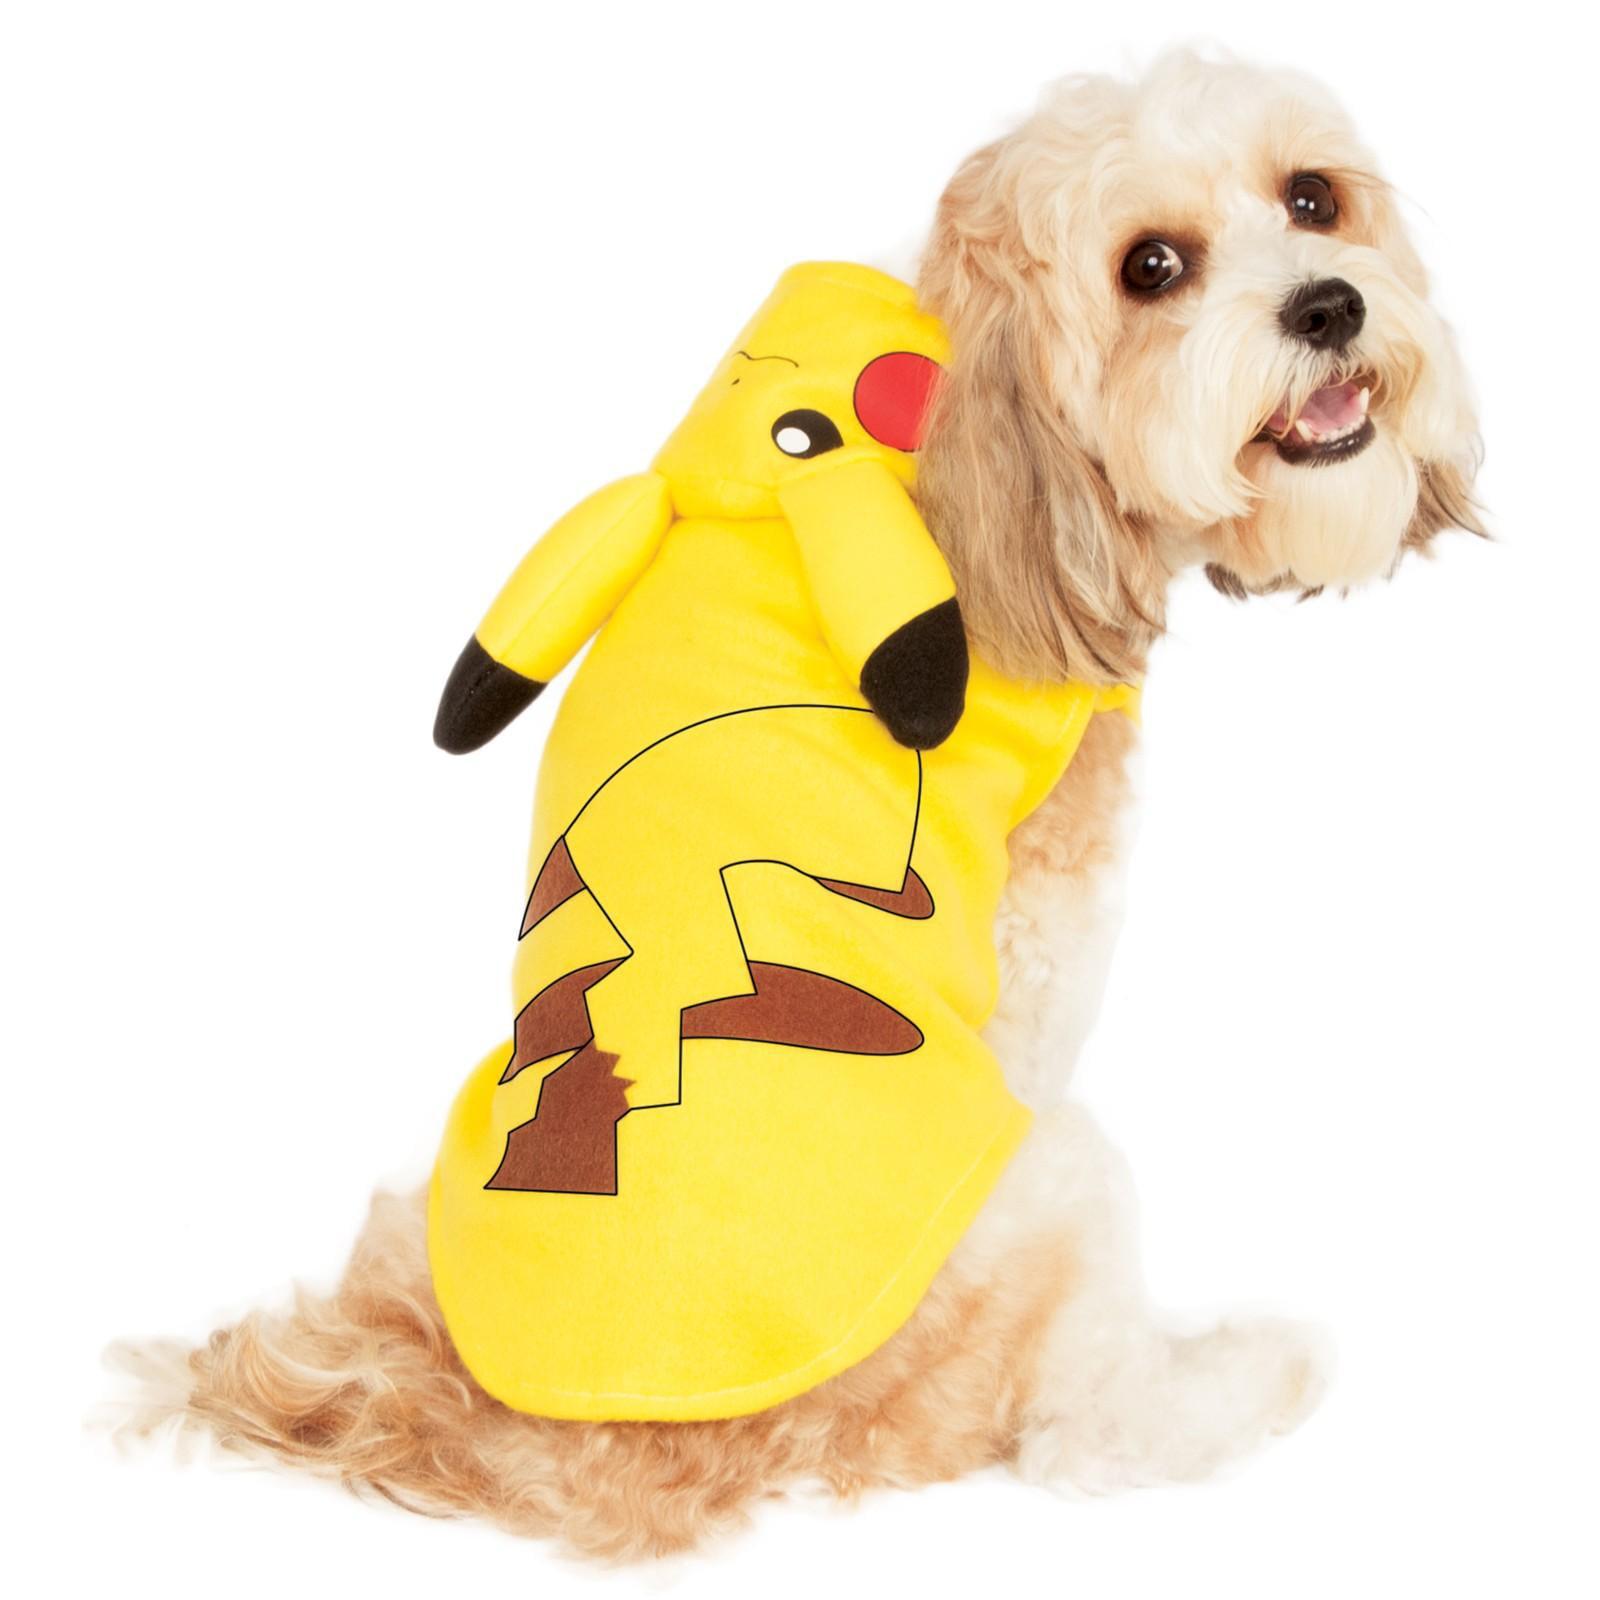 Rubie's Pikachu Pet Costume - Small